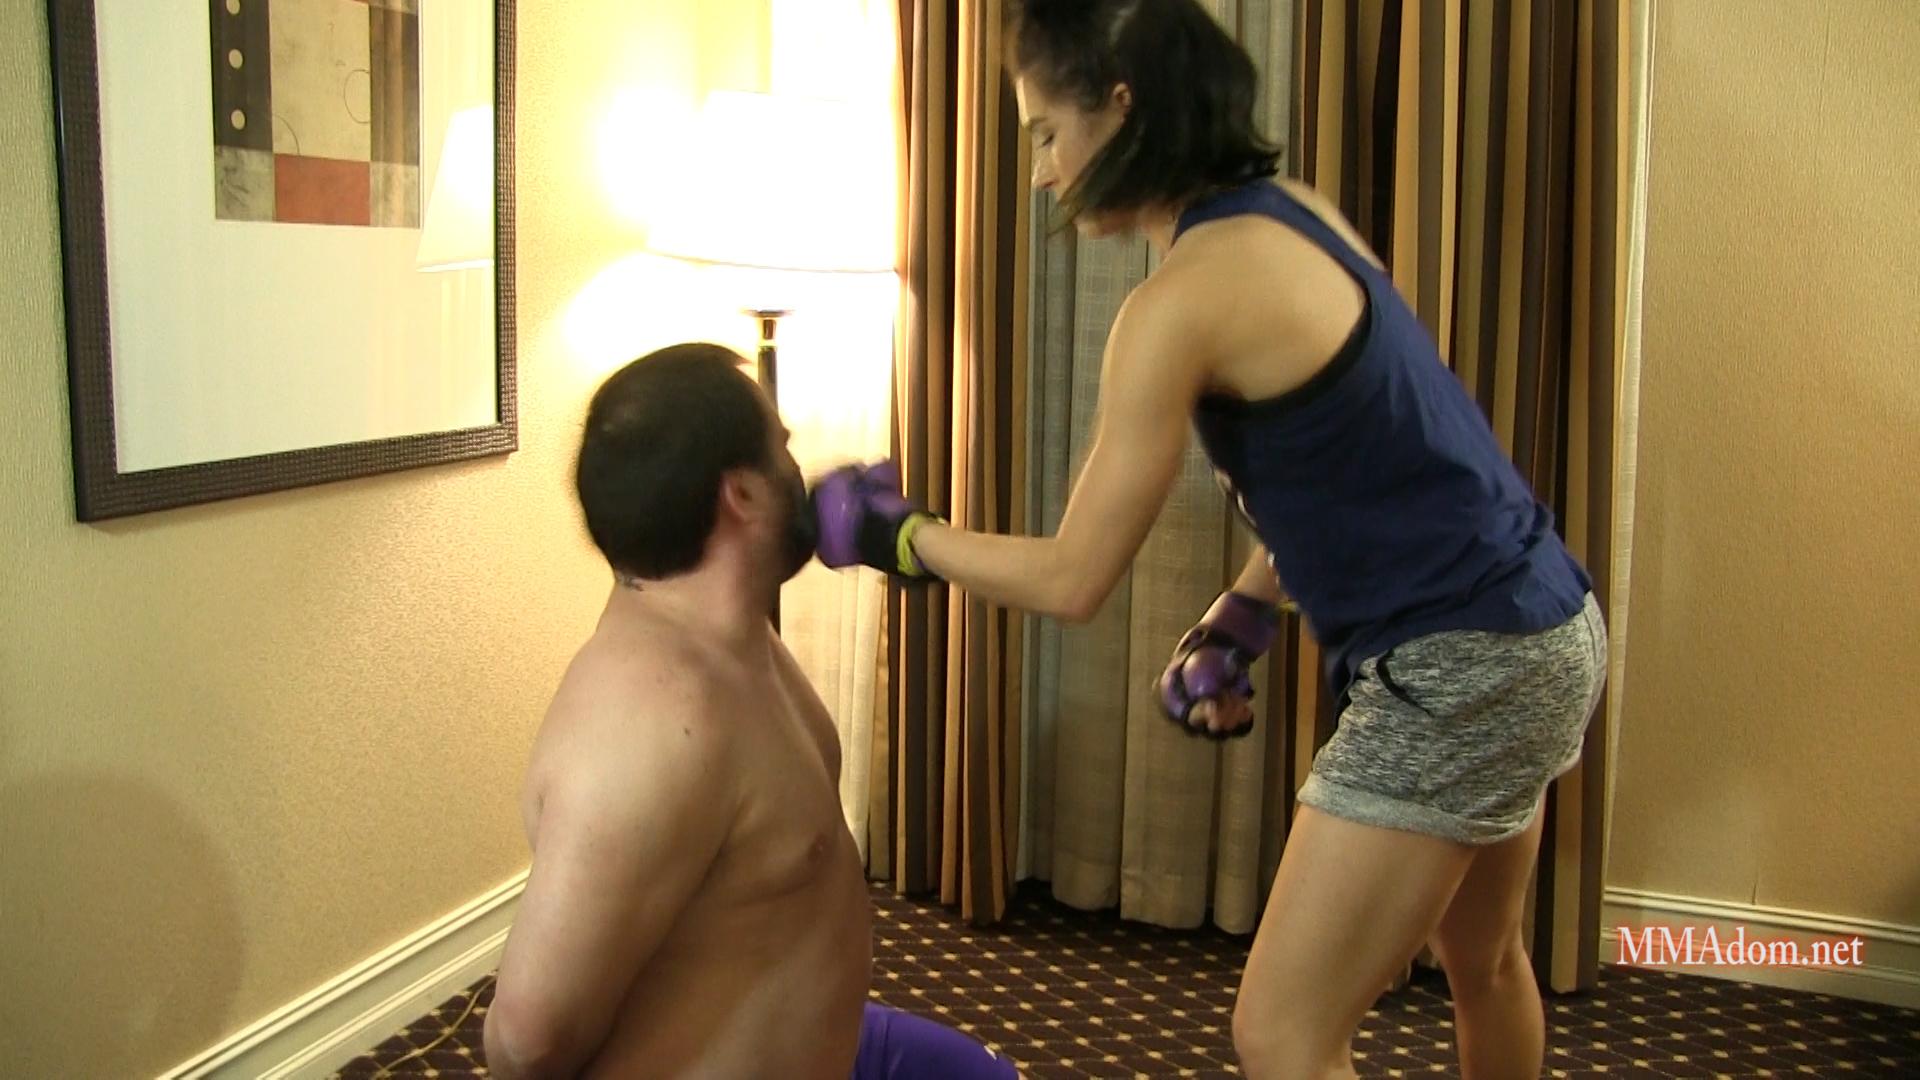 Nikki Next MMA Beatdown edit.Still016